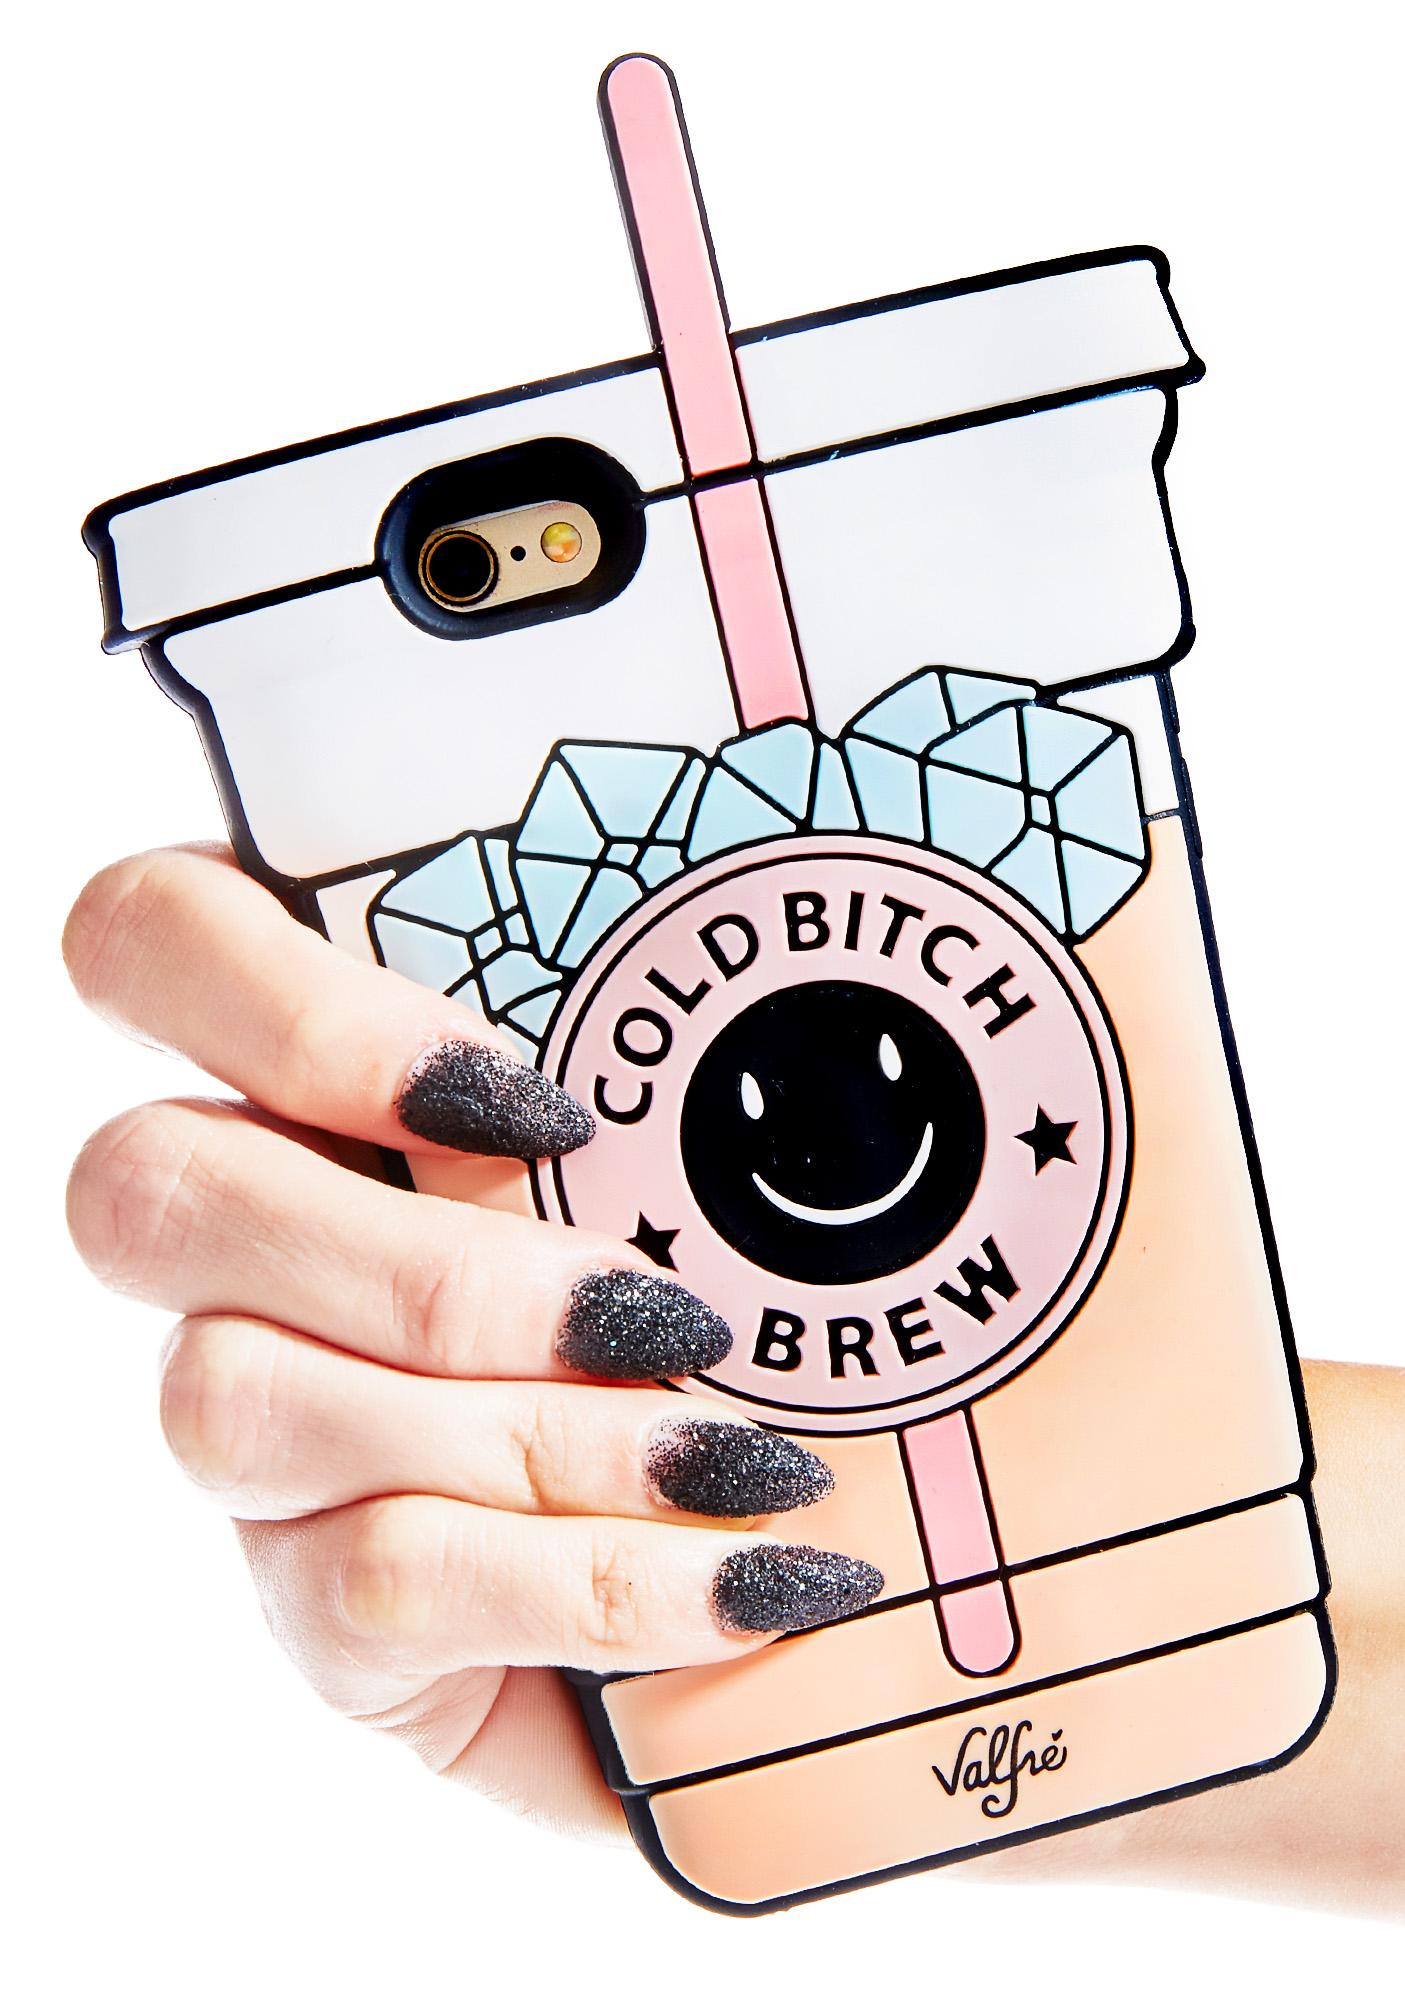 Valfré Cold Bitch Brew iPhone 6/6+ Case